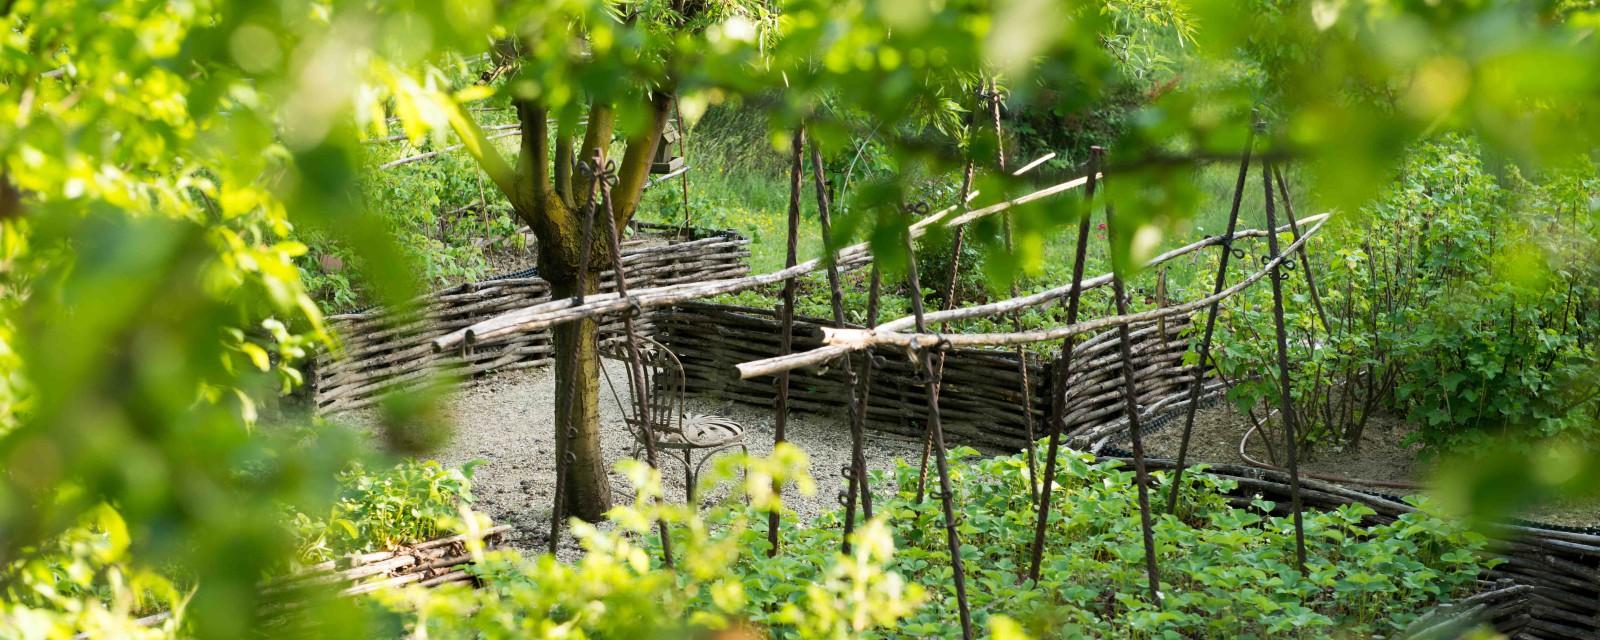 Jardin médiéval maison hotes